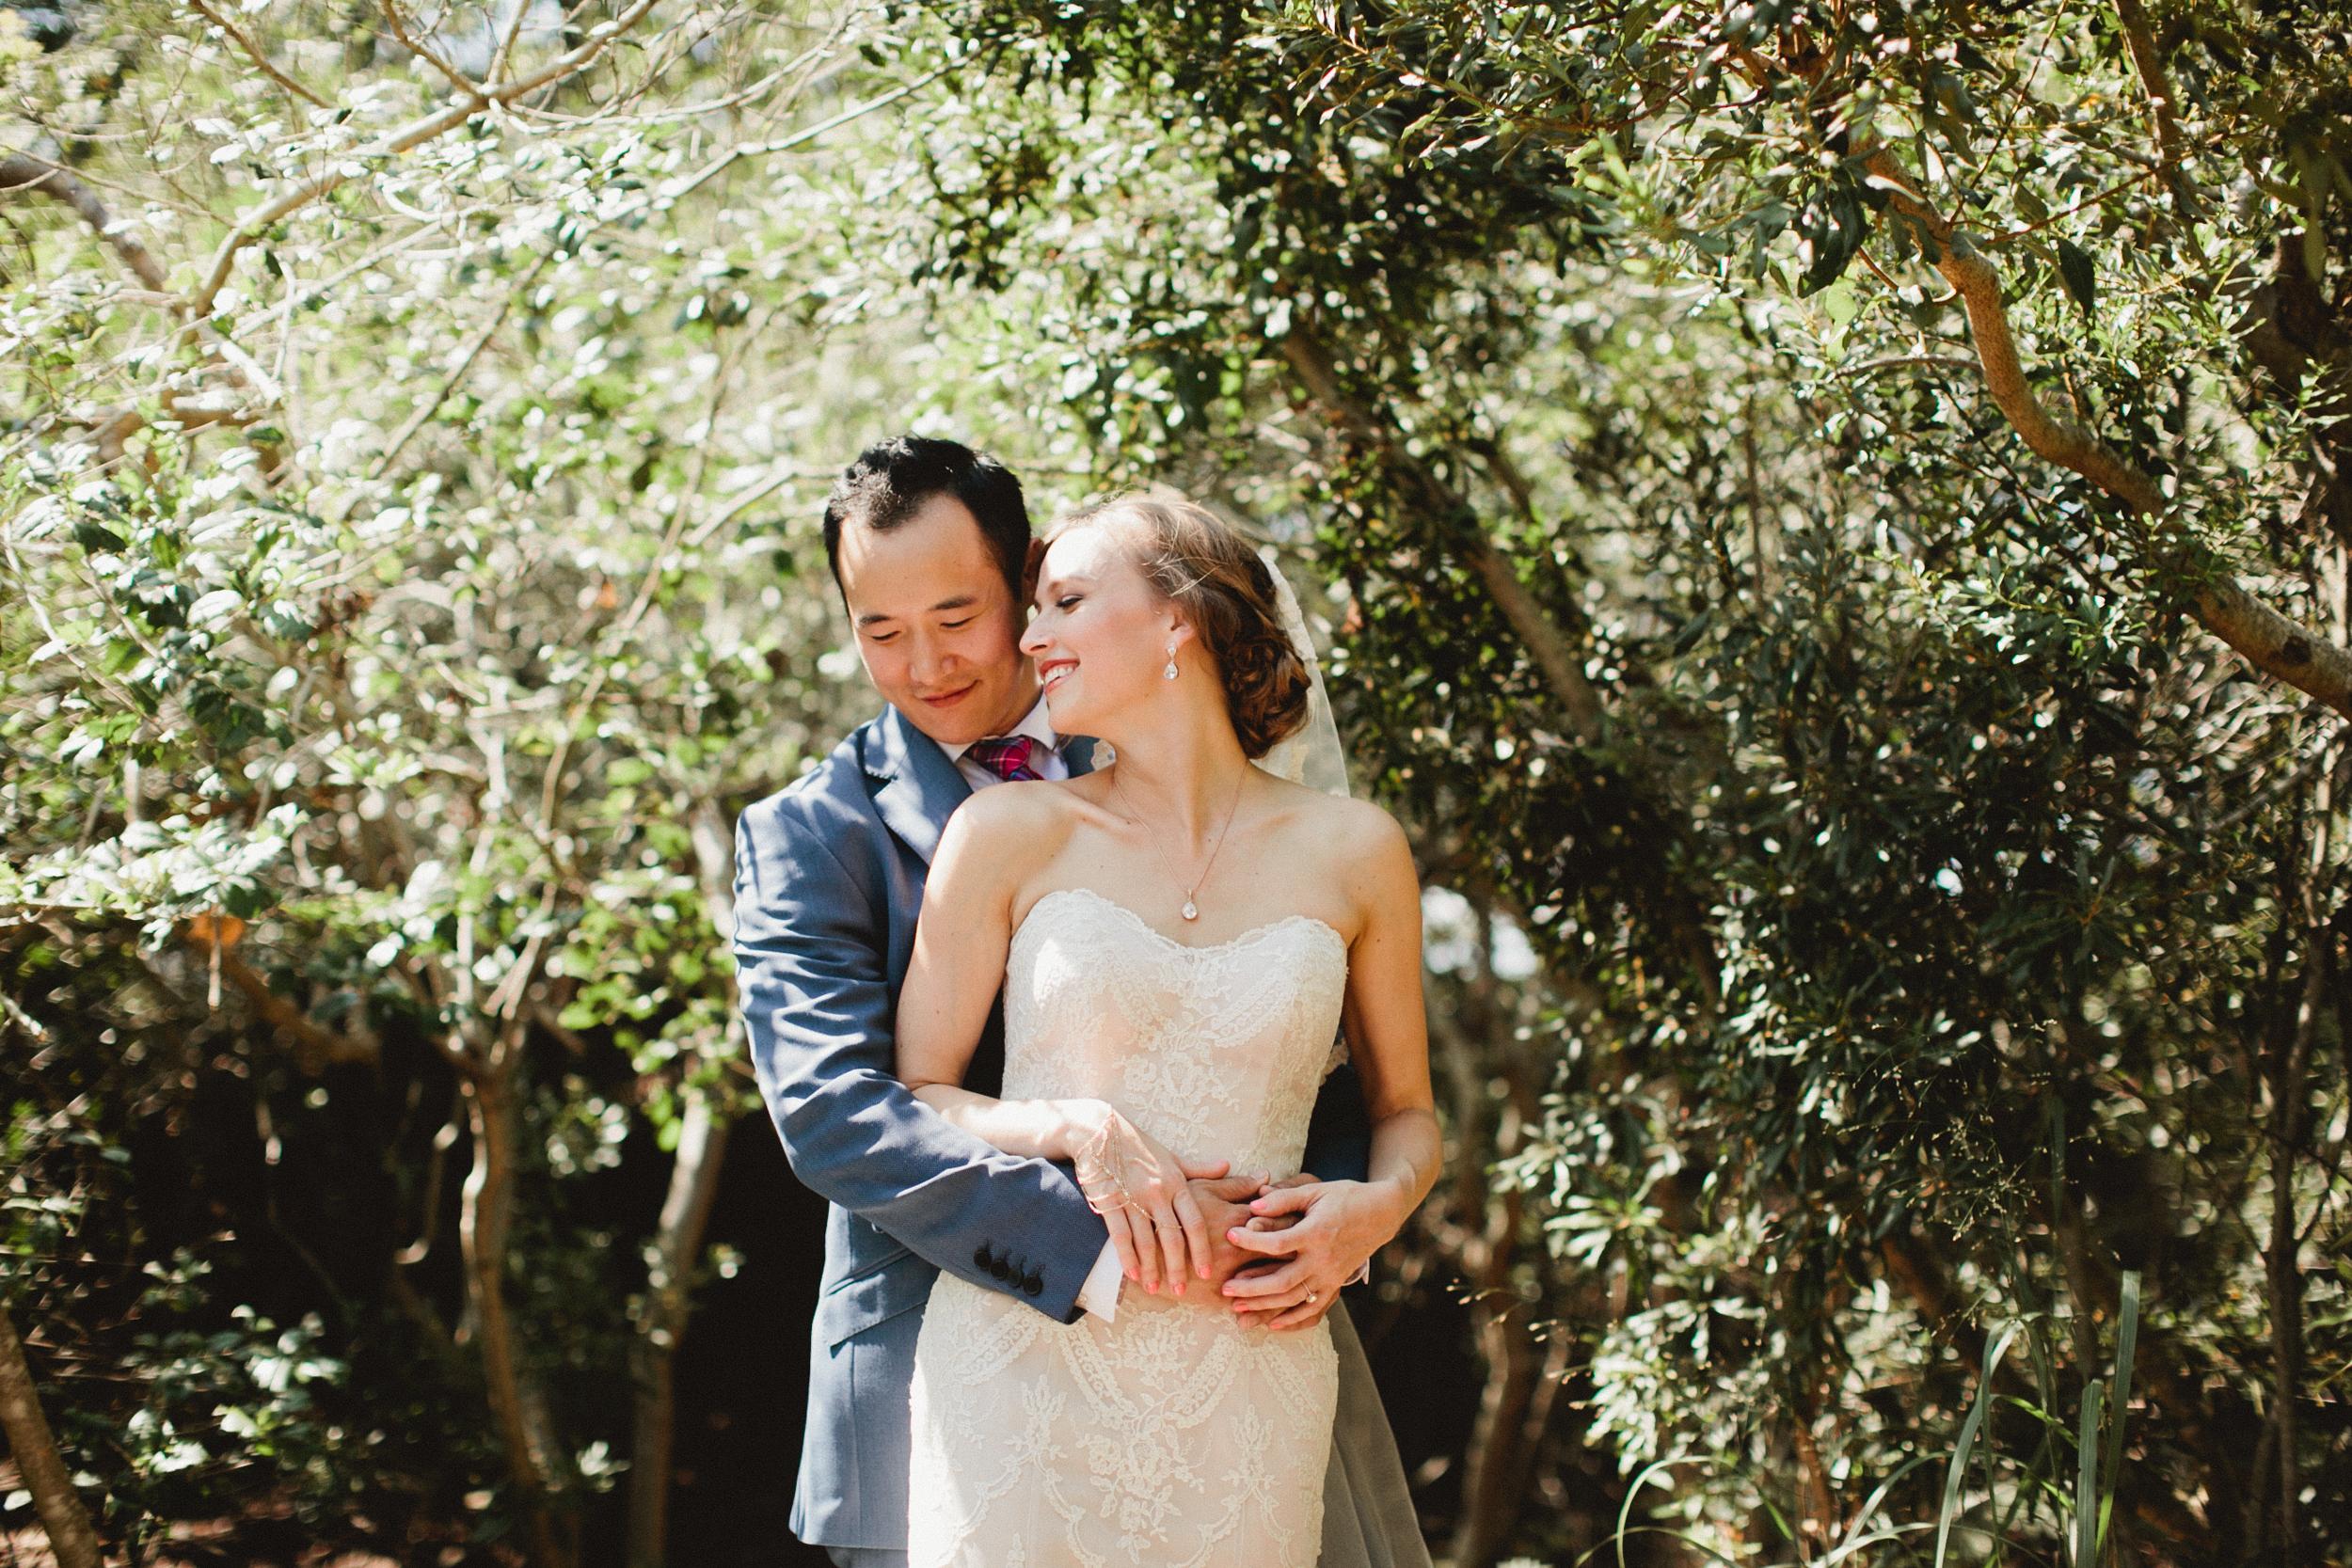 Maine-Wedding-Photographer-976.jpg